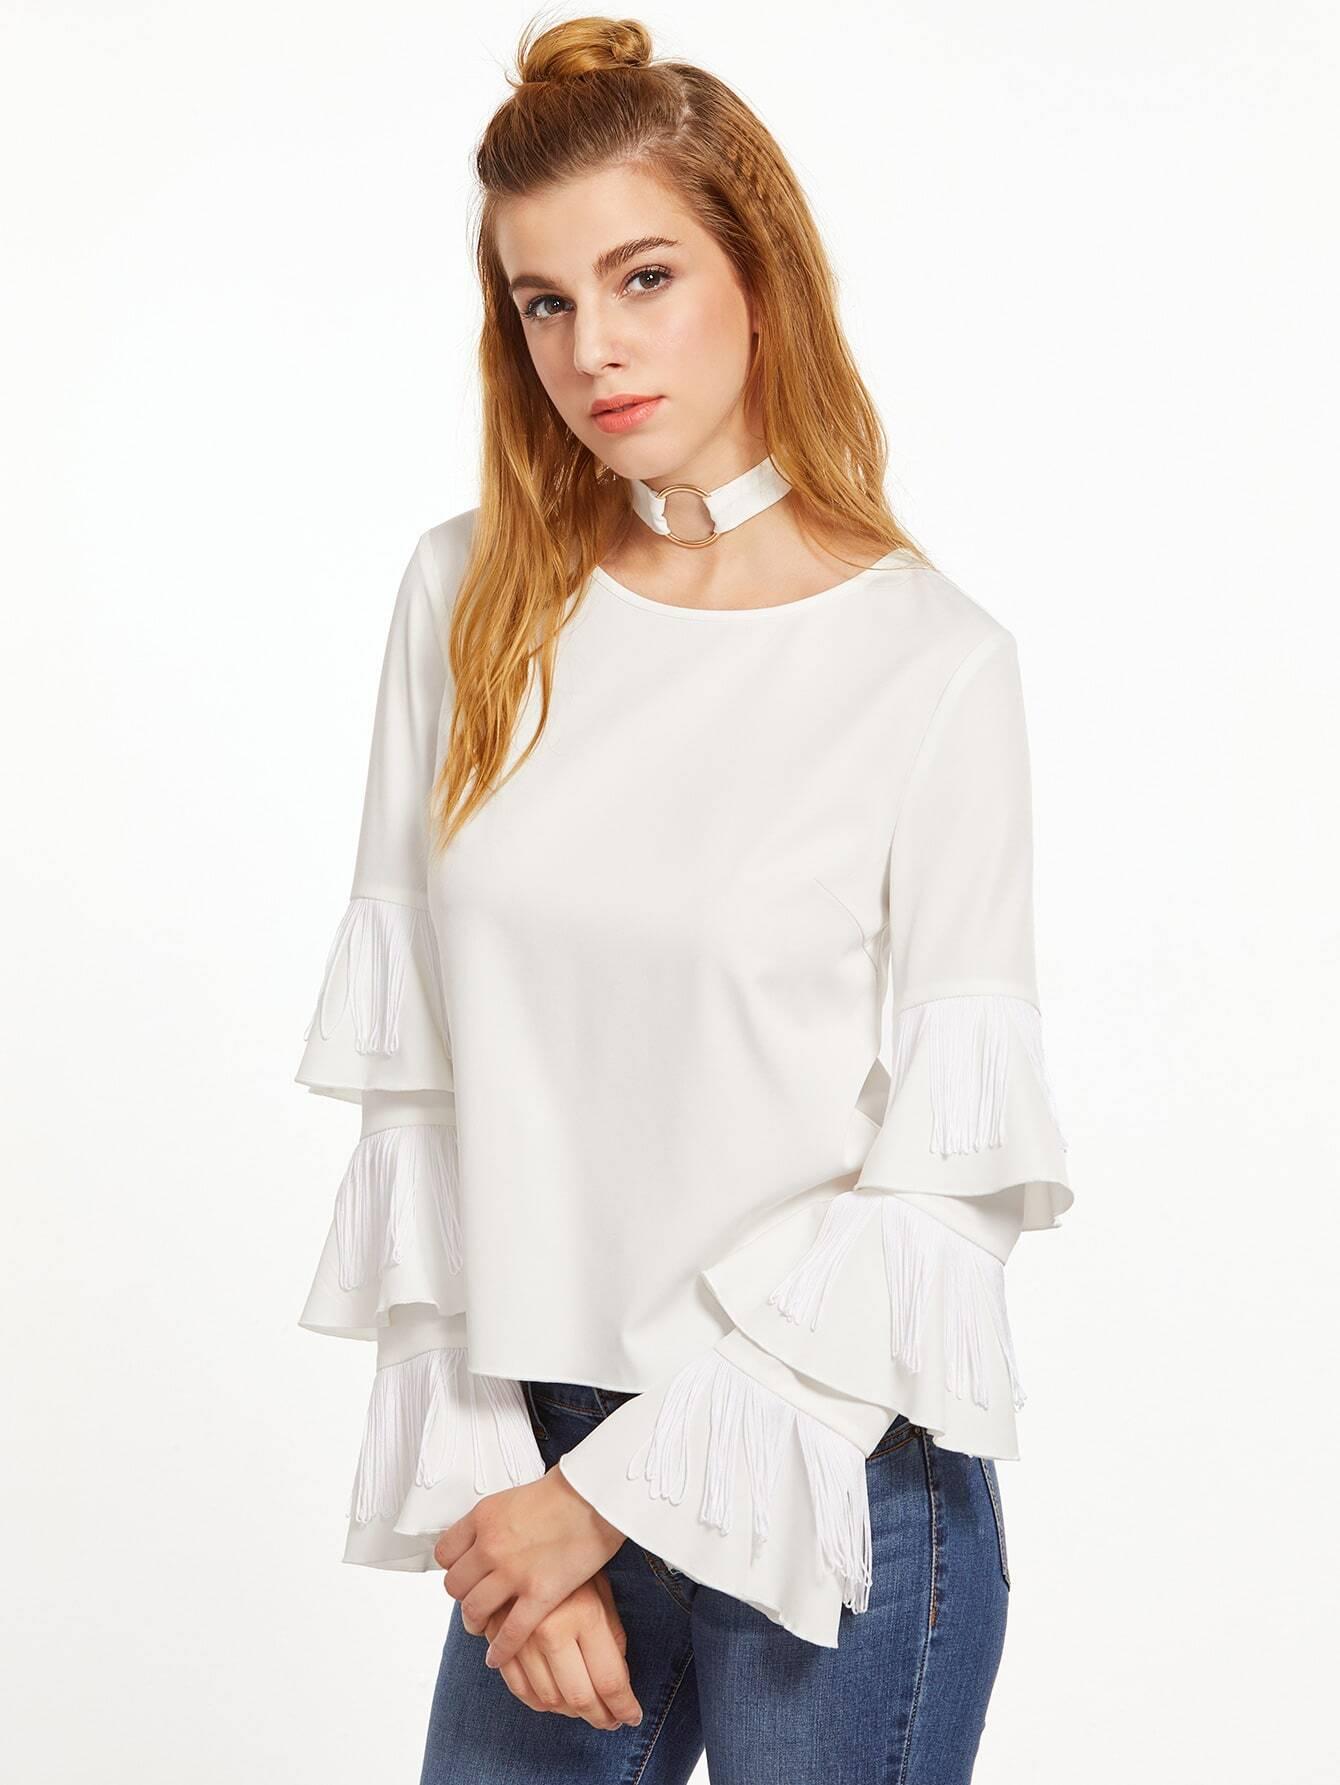 blouse161121704_2